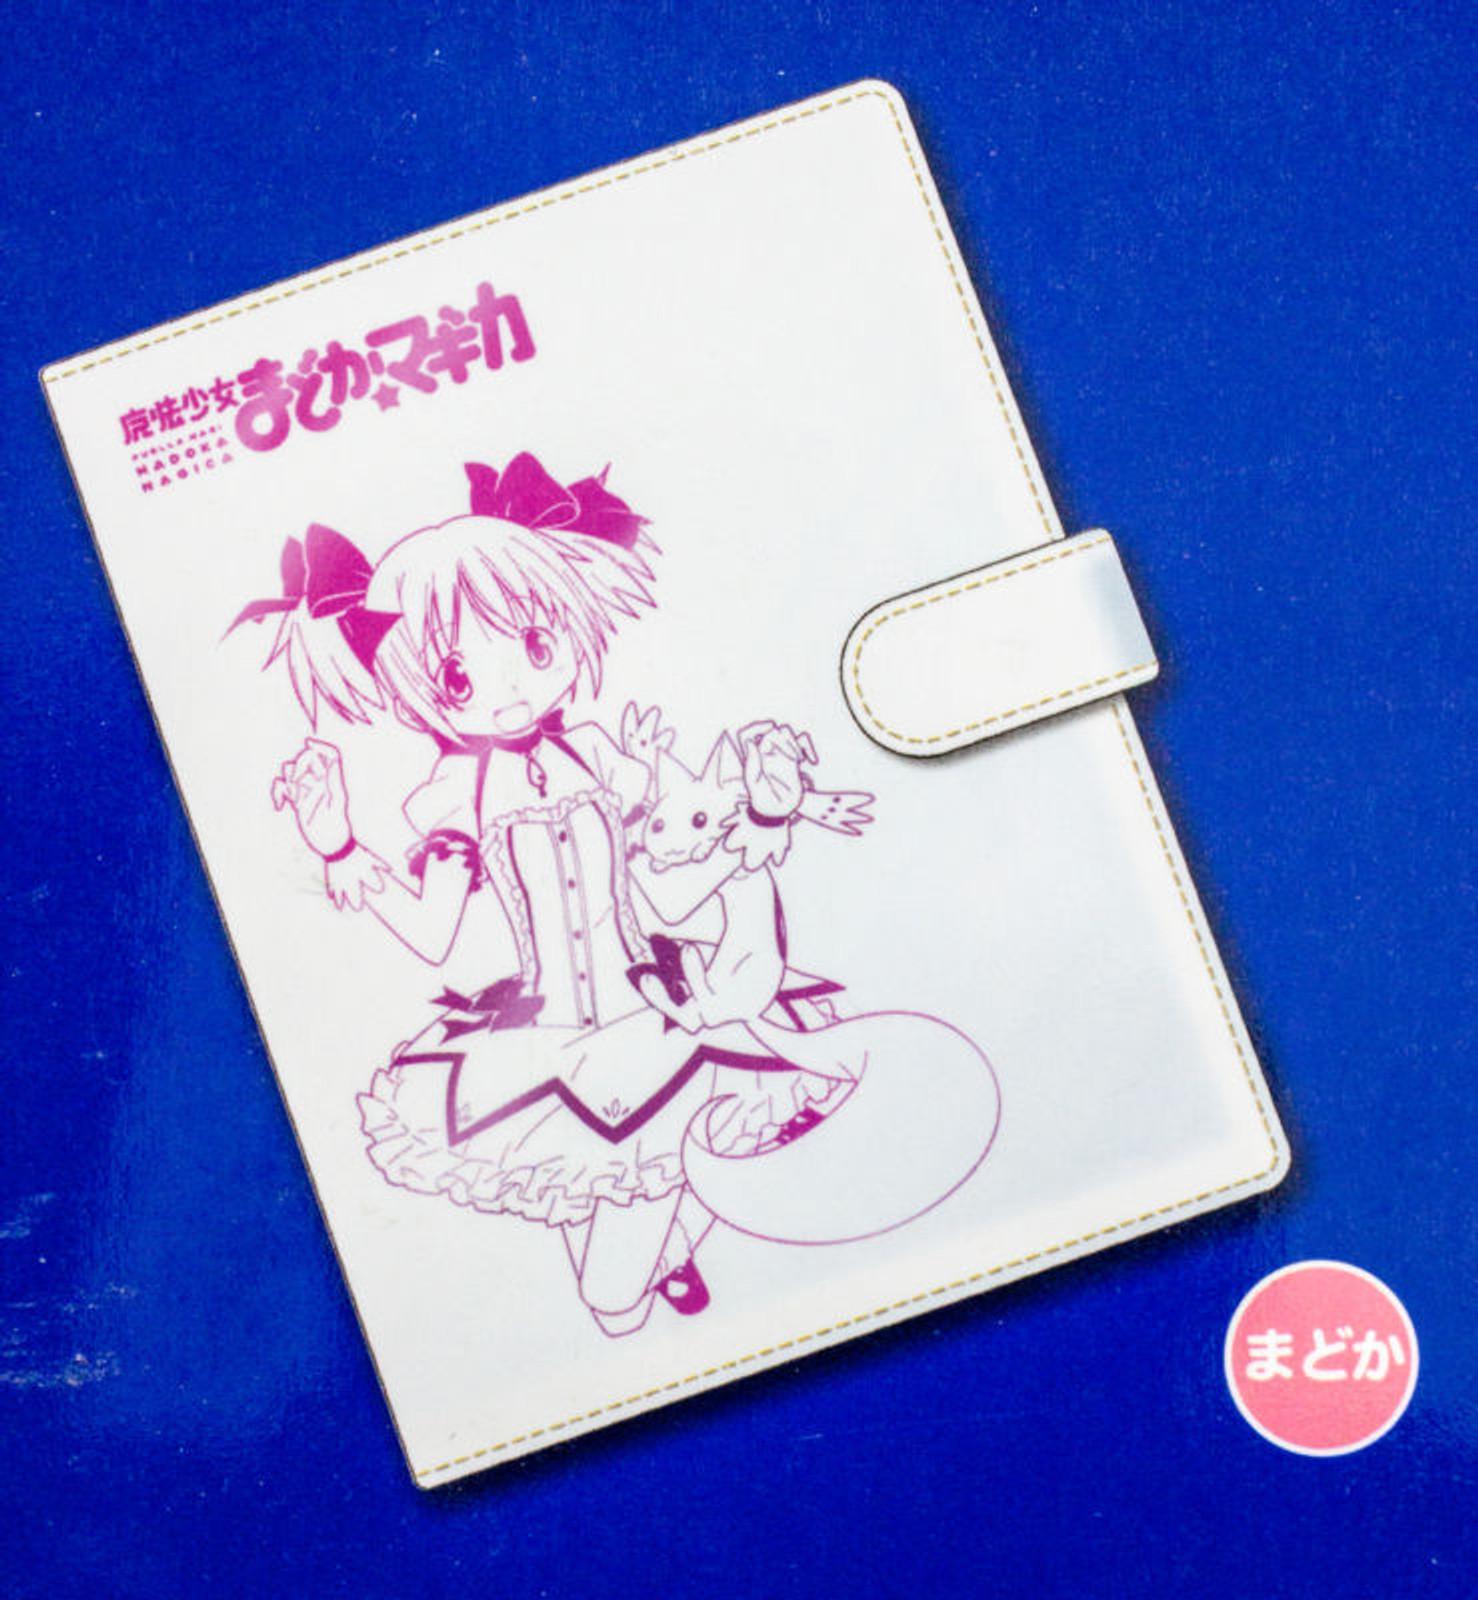 Puella Magi Madoka Magica Personal Organizer Notebook Madoka Ver. JAPAN ANIME